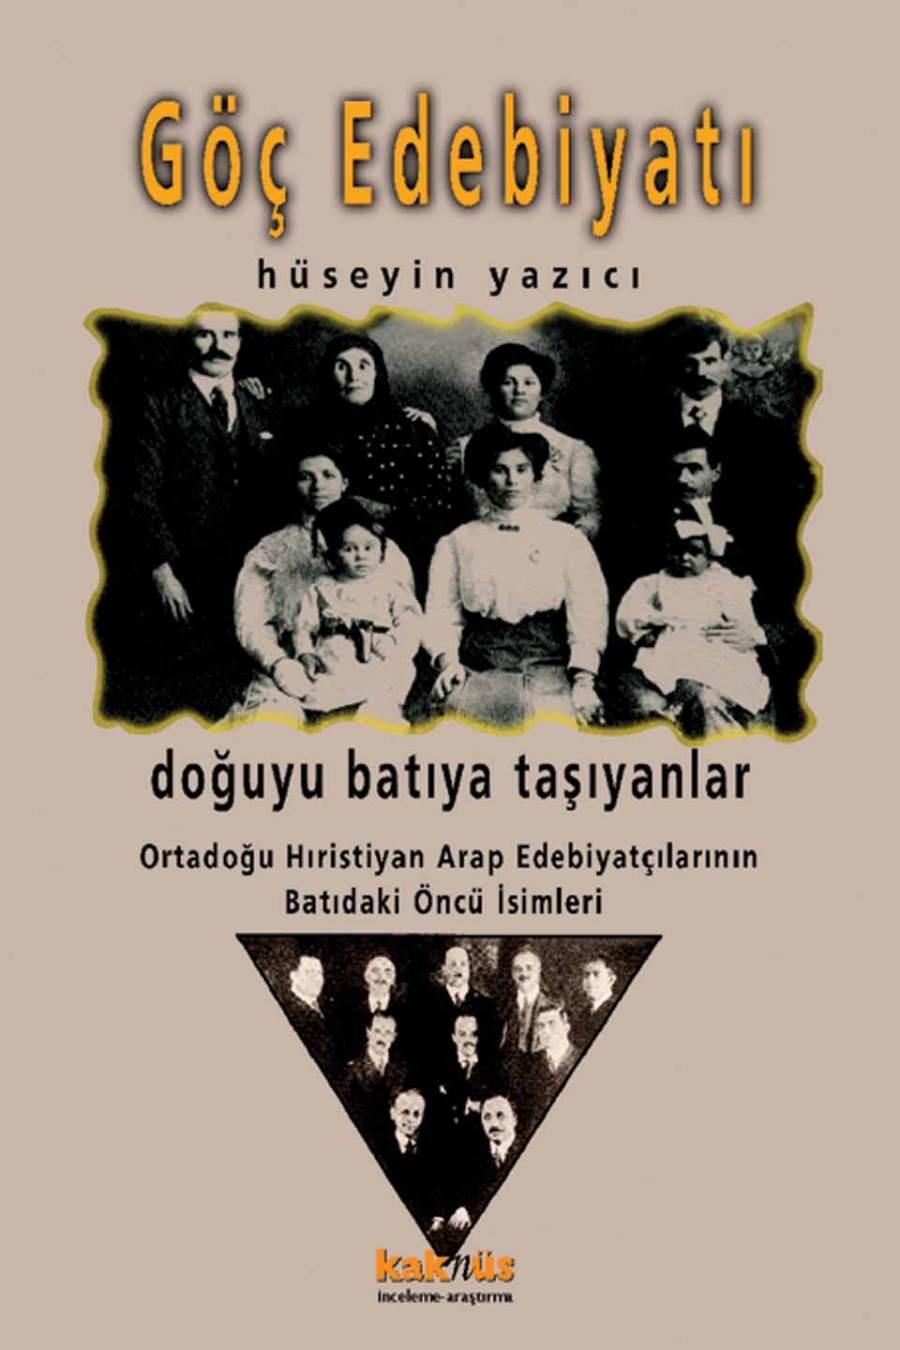 Goc-Edebiyati